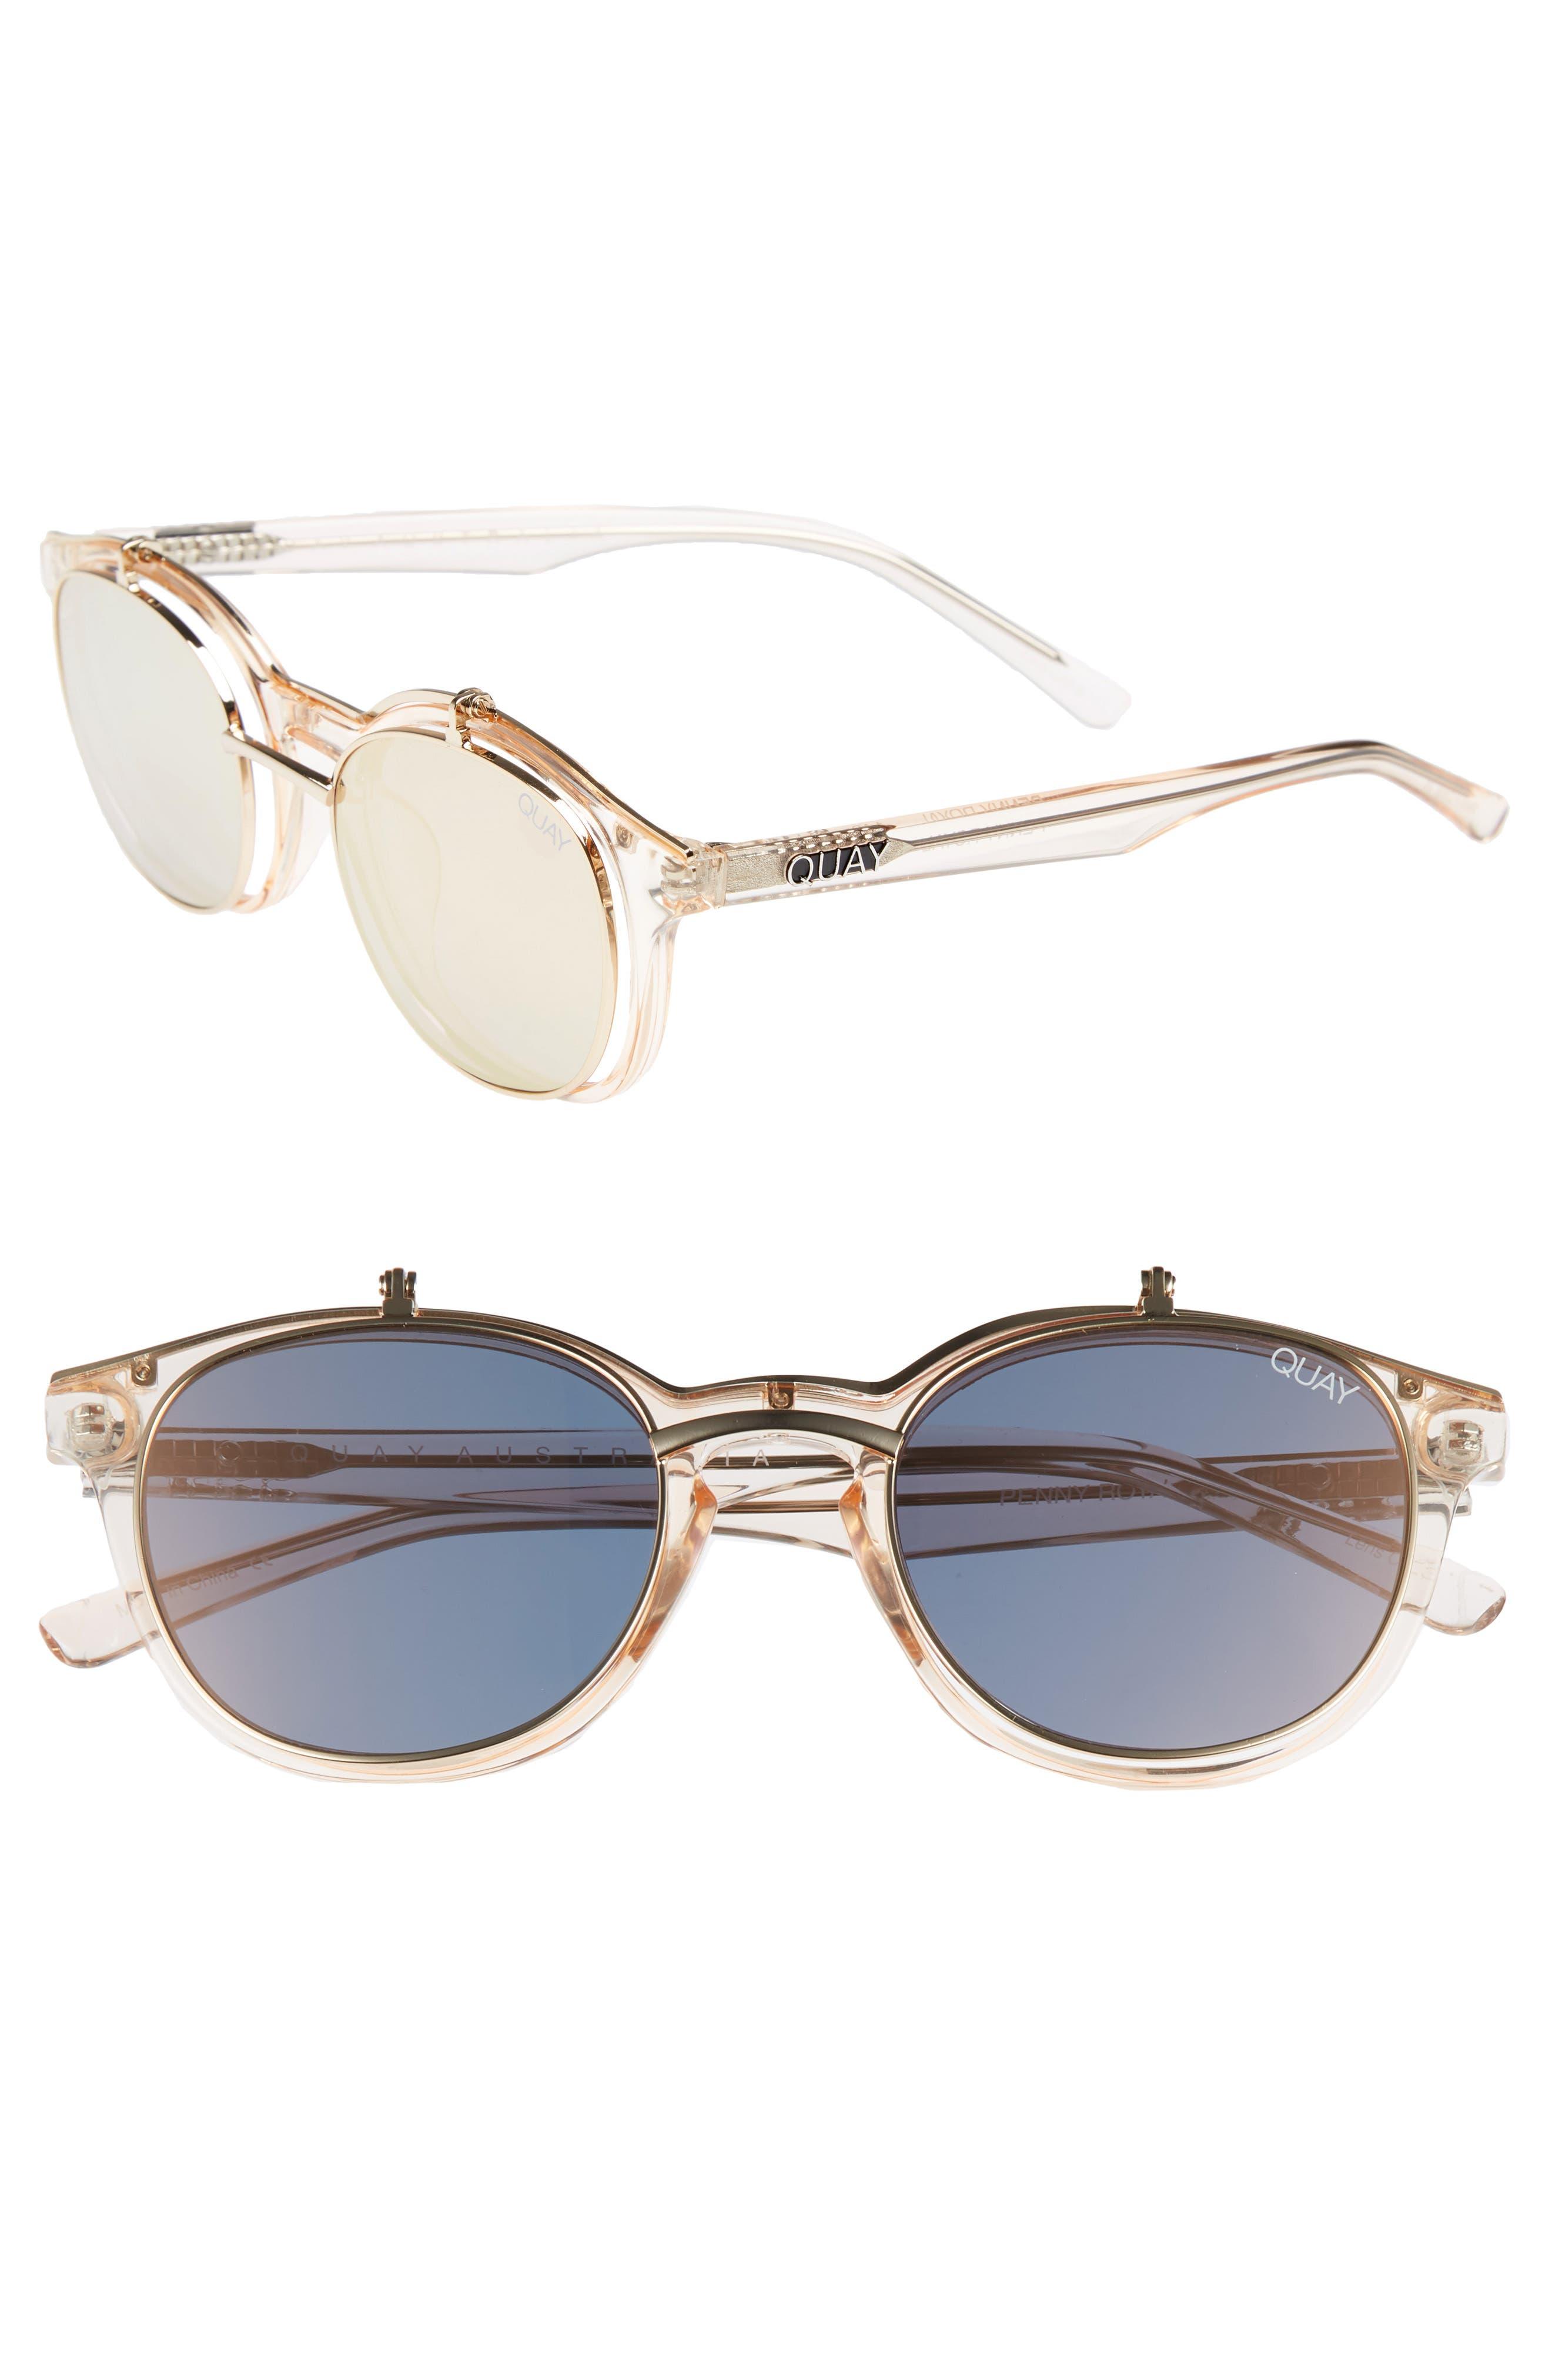 Quay Australia Penny Royal 55mm Flip-Up Round Sunglasses